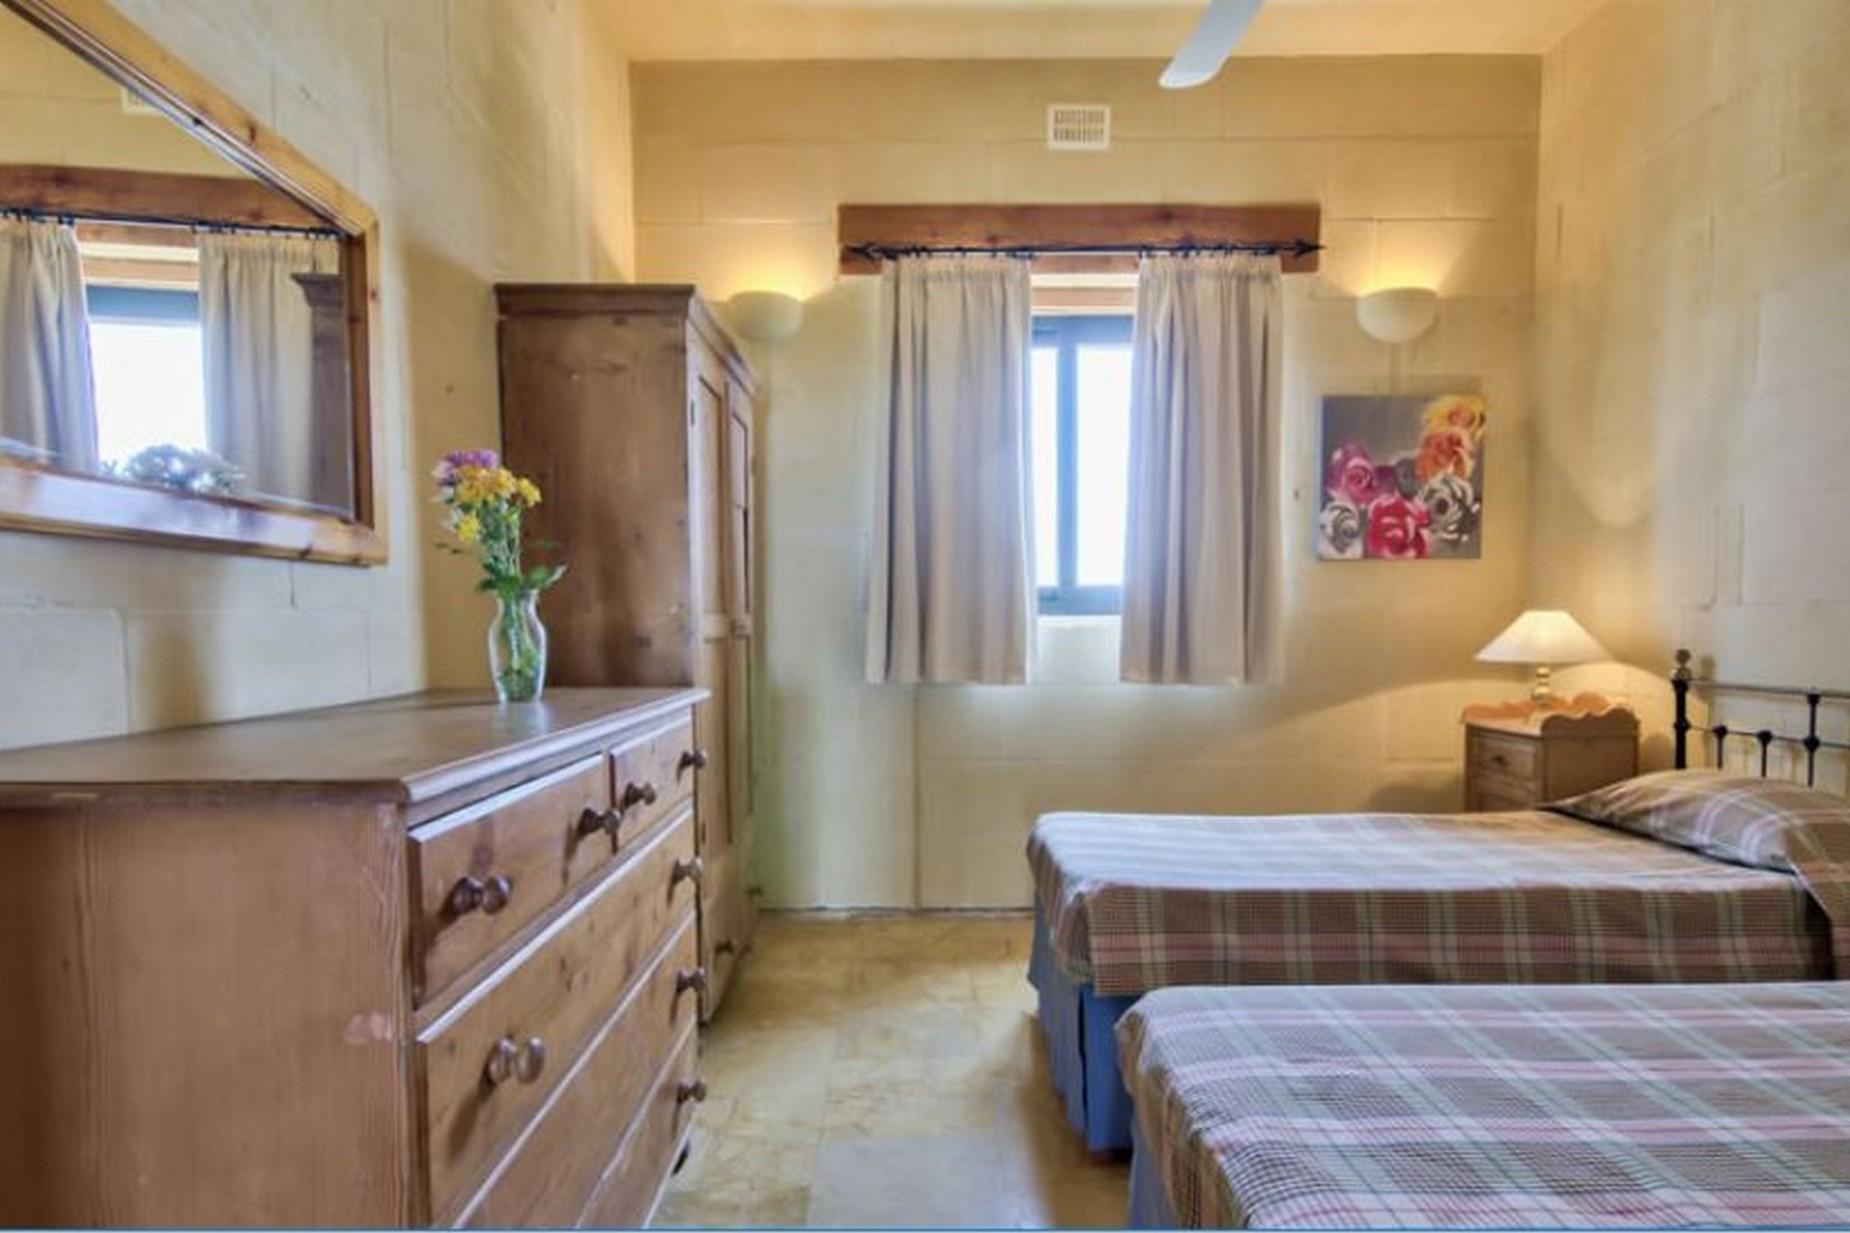 4 bed Farmhouse For Sale in Kercem, Kercem - thumb 12